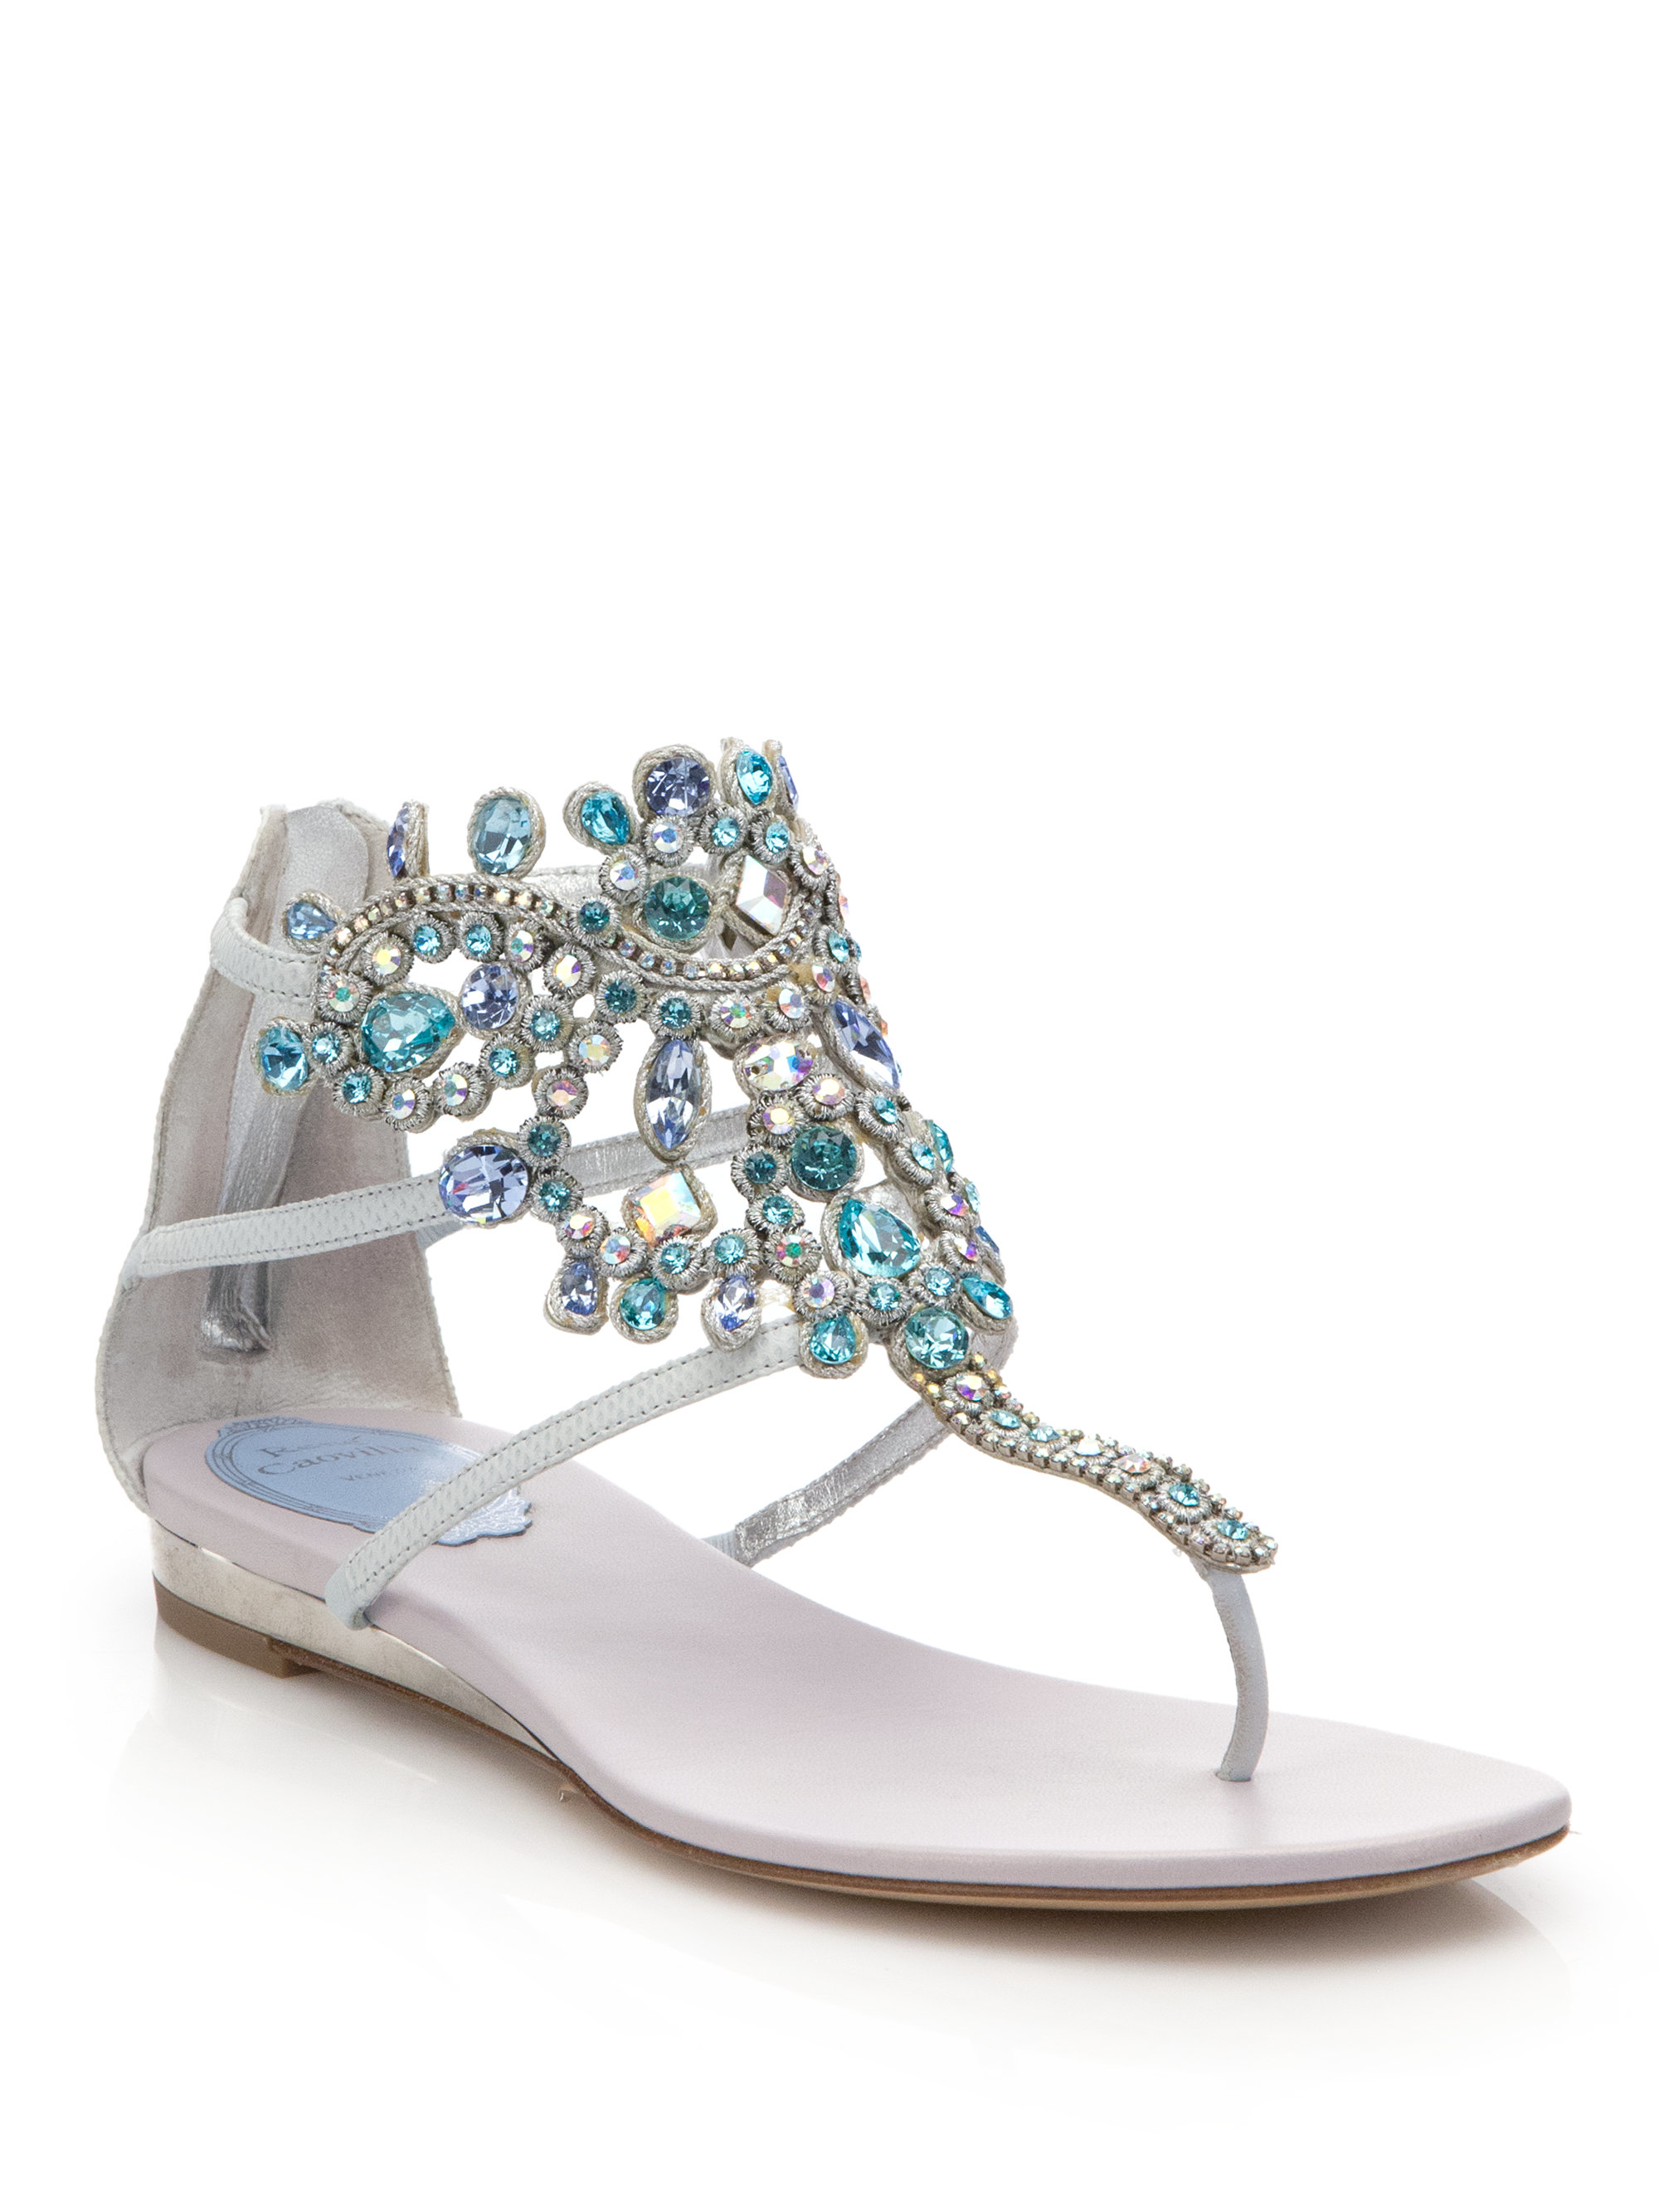 52e1e19144056c Lyst - Rene Caovilla Swarovski Crystal-embellished Snakeskin Sandals ...